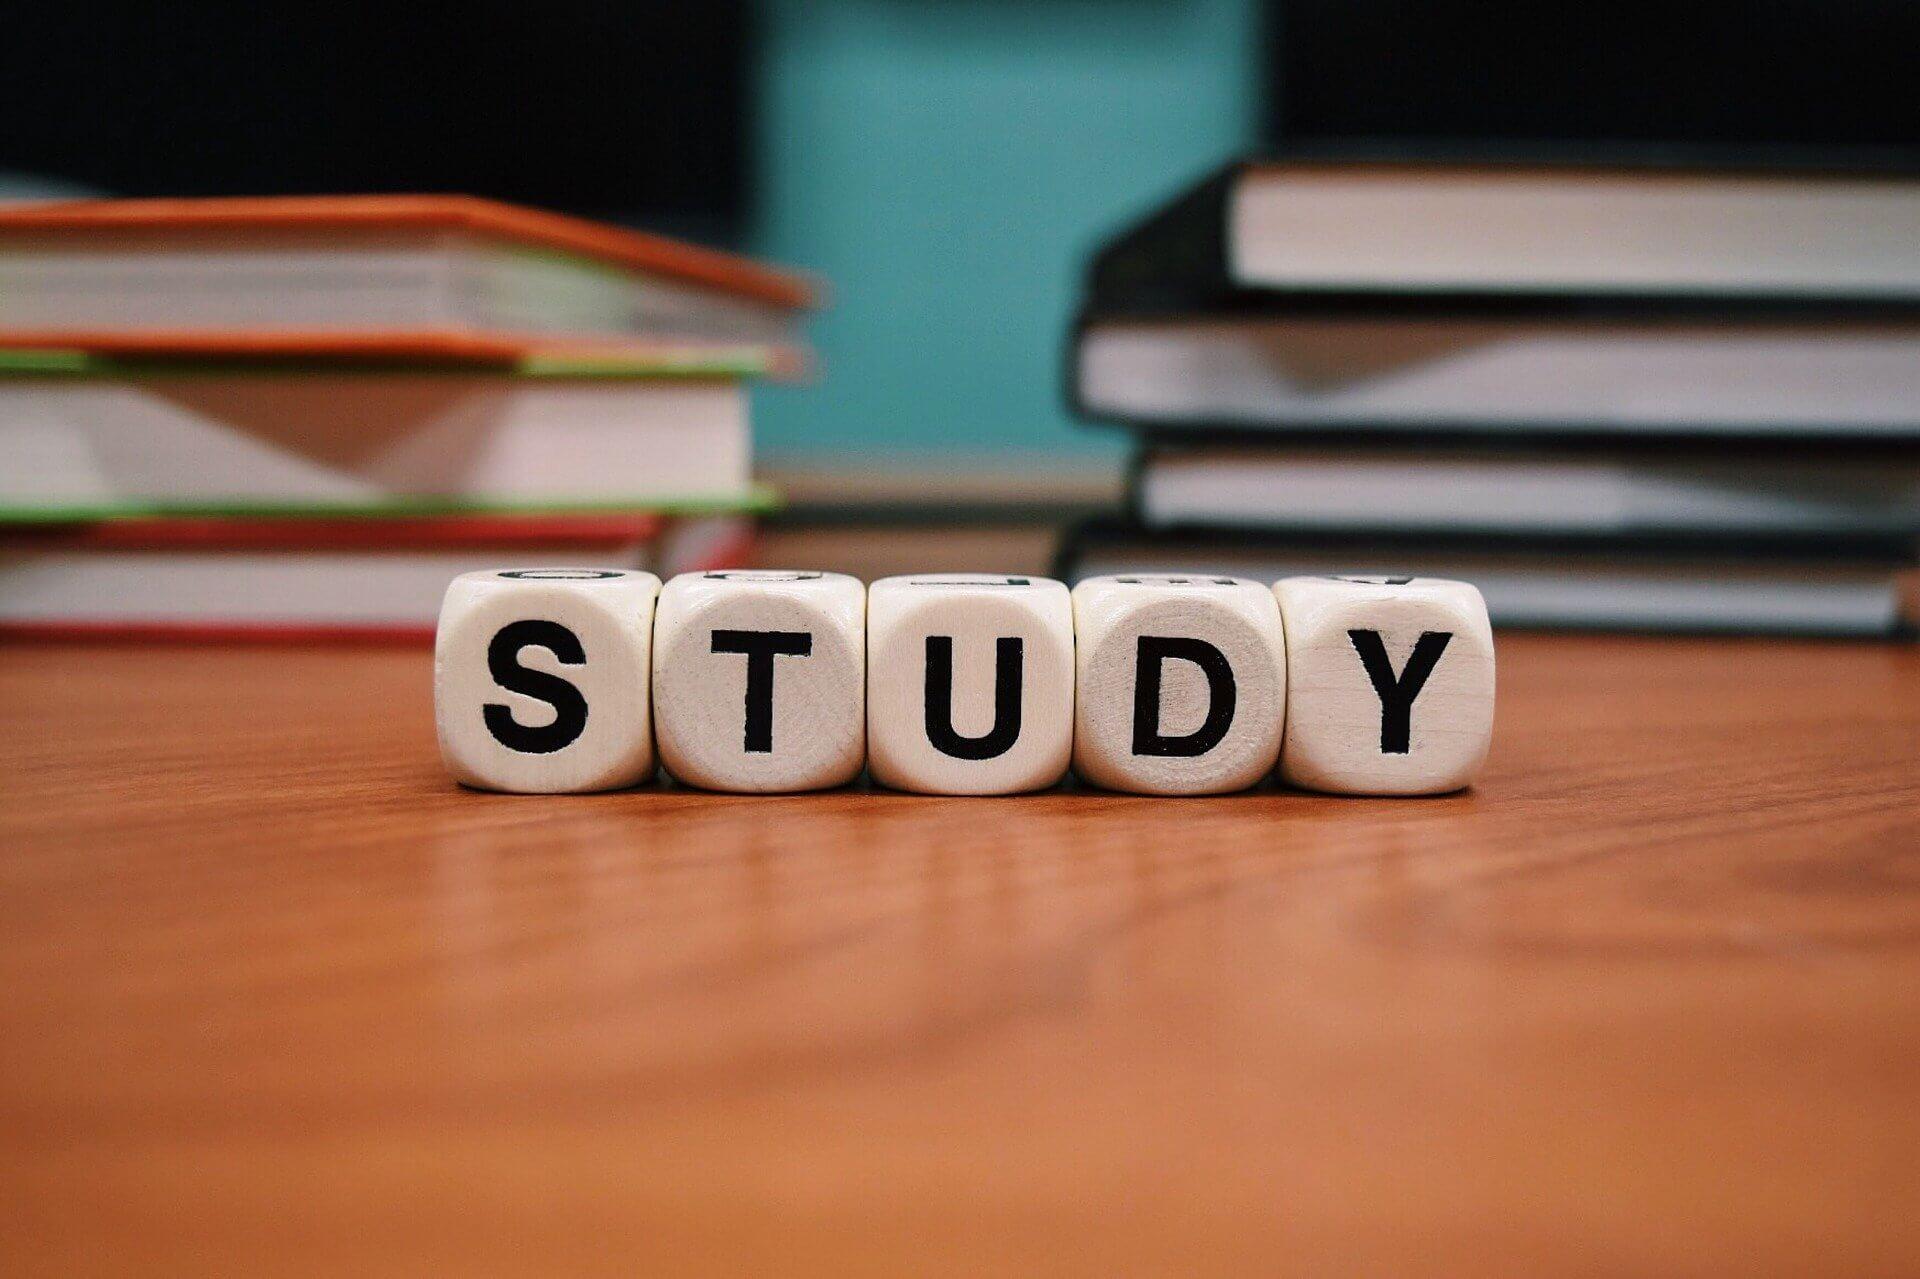 STUDYの文字